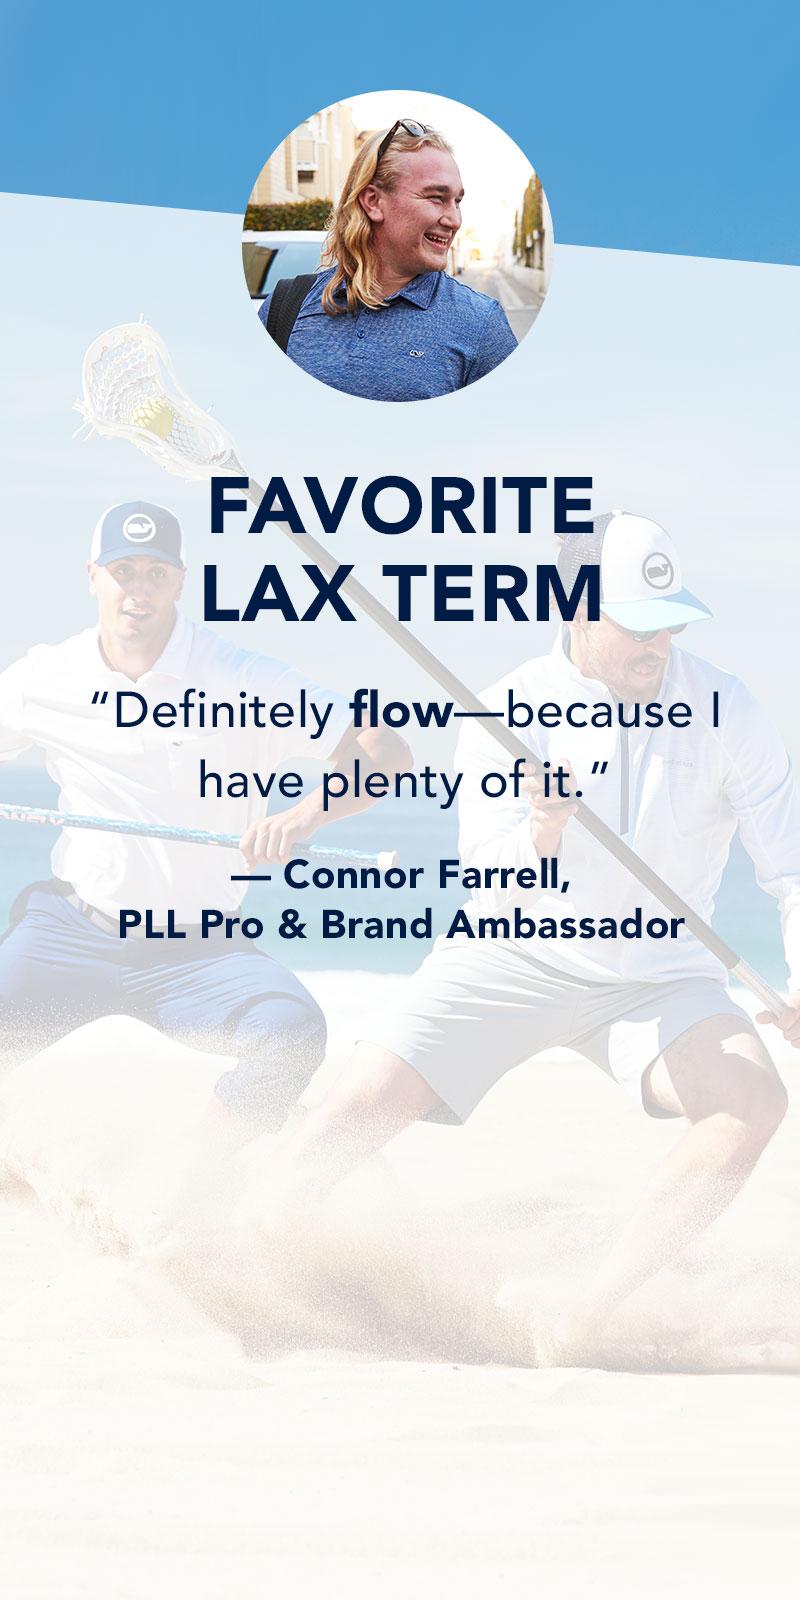 Favorite Lax Term: Definitely flow-because I have plenty of it. Connor Farrell, PLL Pro & Brand Ambassador